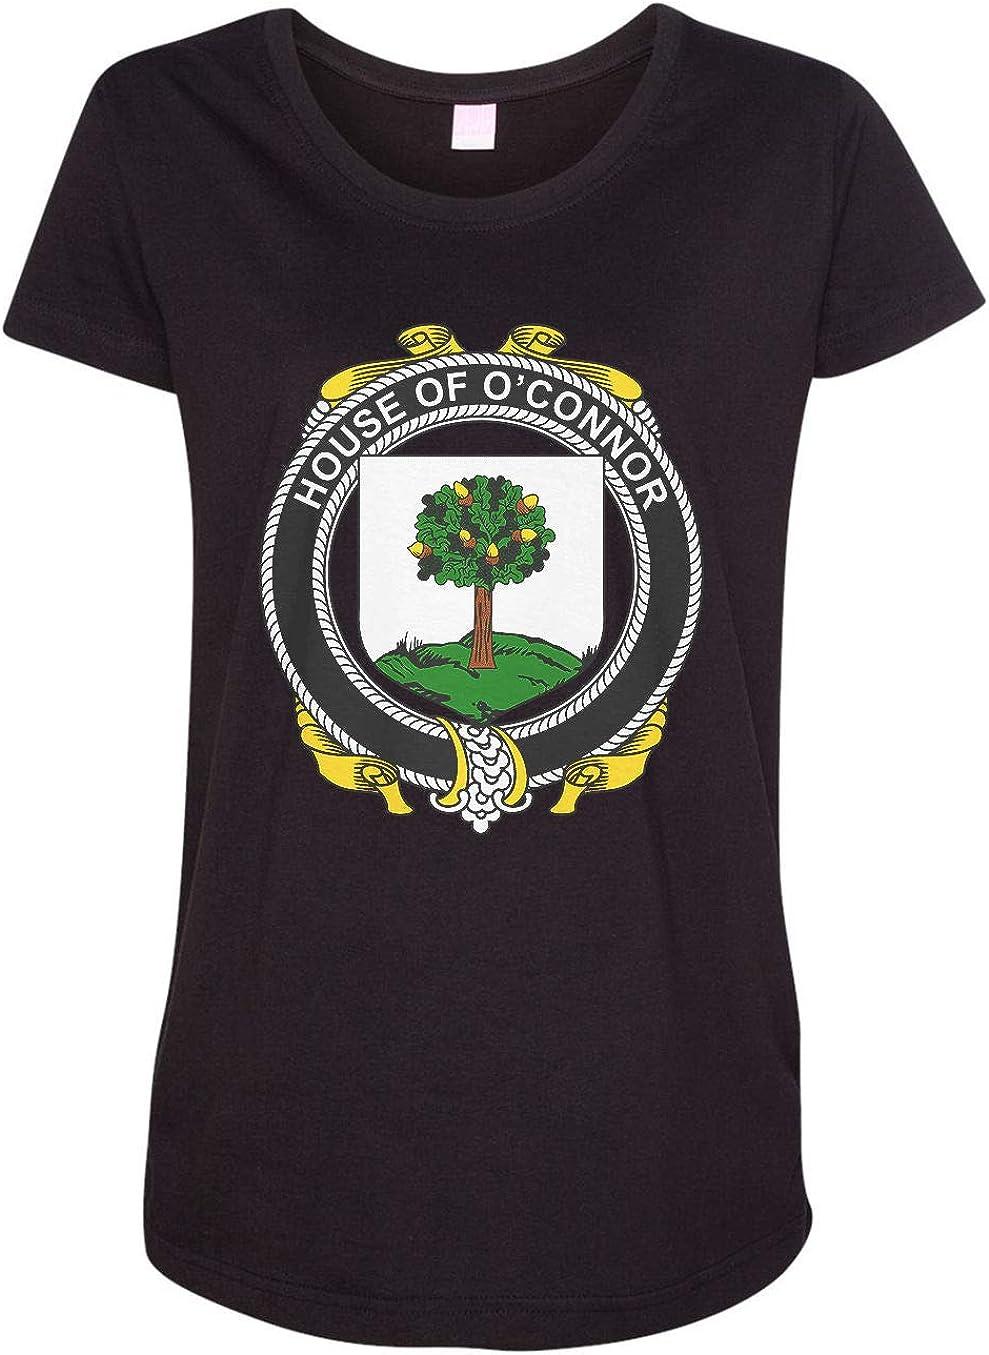 HARD EDGE DESIGN Women's Irish House Heraldry O'Connor (Faly) T-Shirt